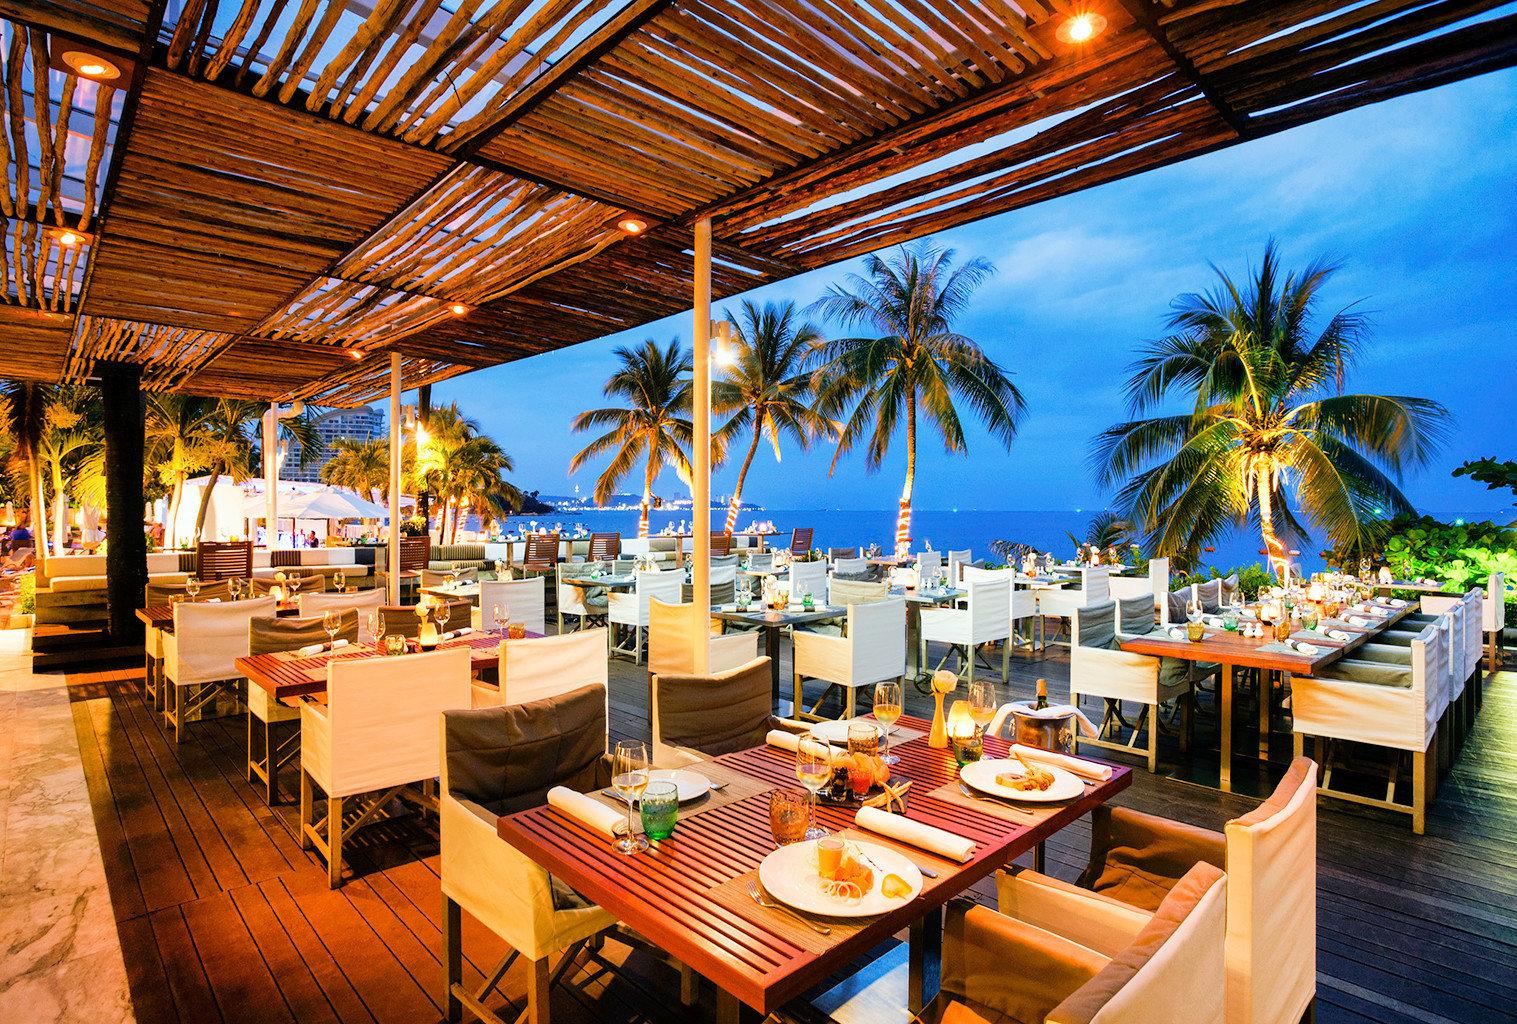 Beachfront Deck Dining Drink Eat Family Honeymoon Island Outdoors Resort Romance Sunset restaurant